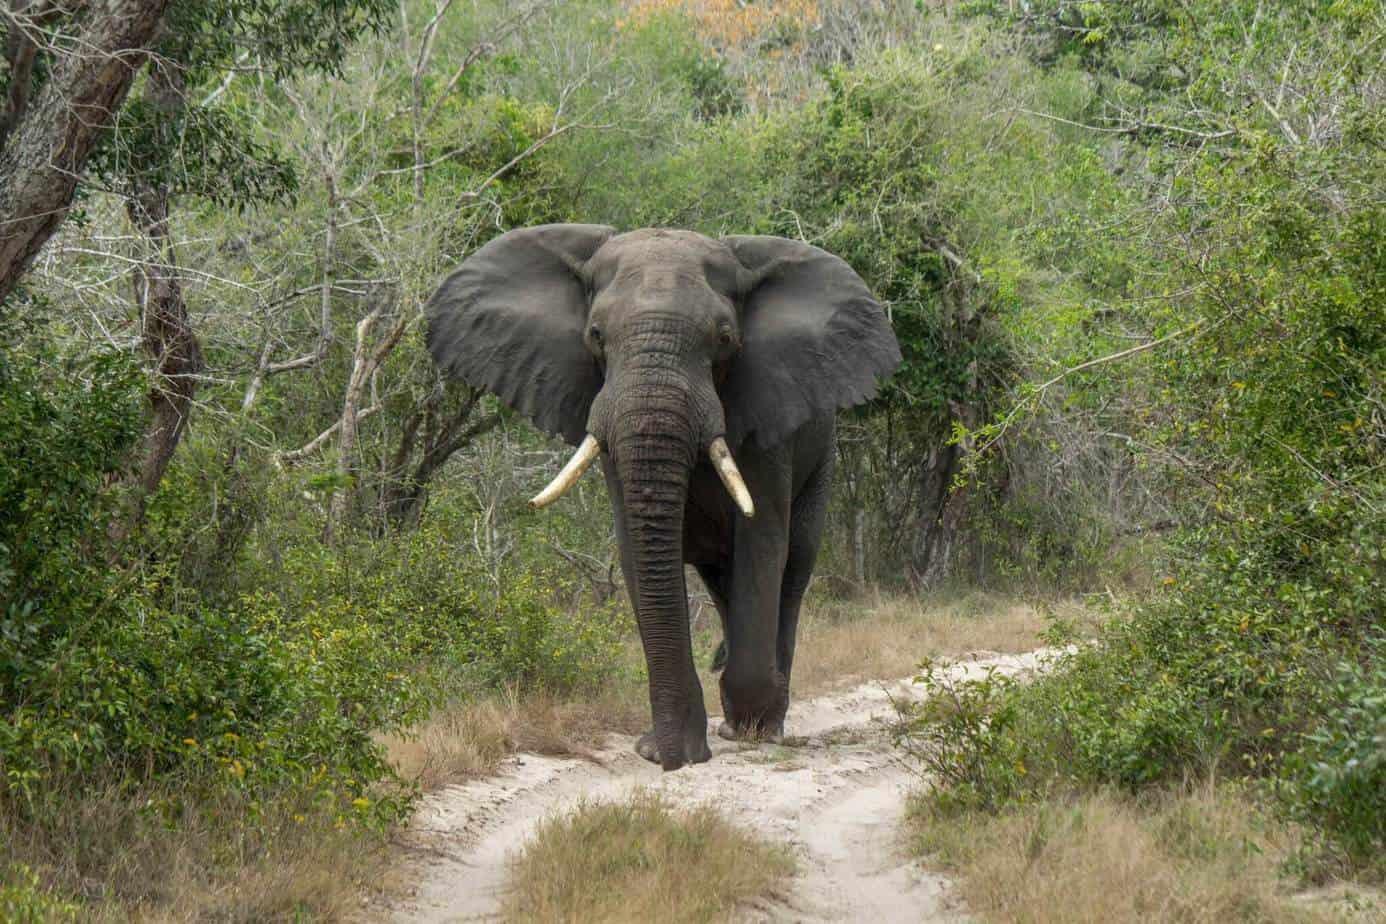 African Bush Elephant @ Tembe Elephant Park. Photo: Håvard Rosenlund